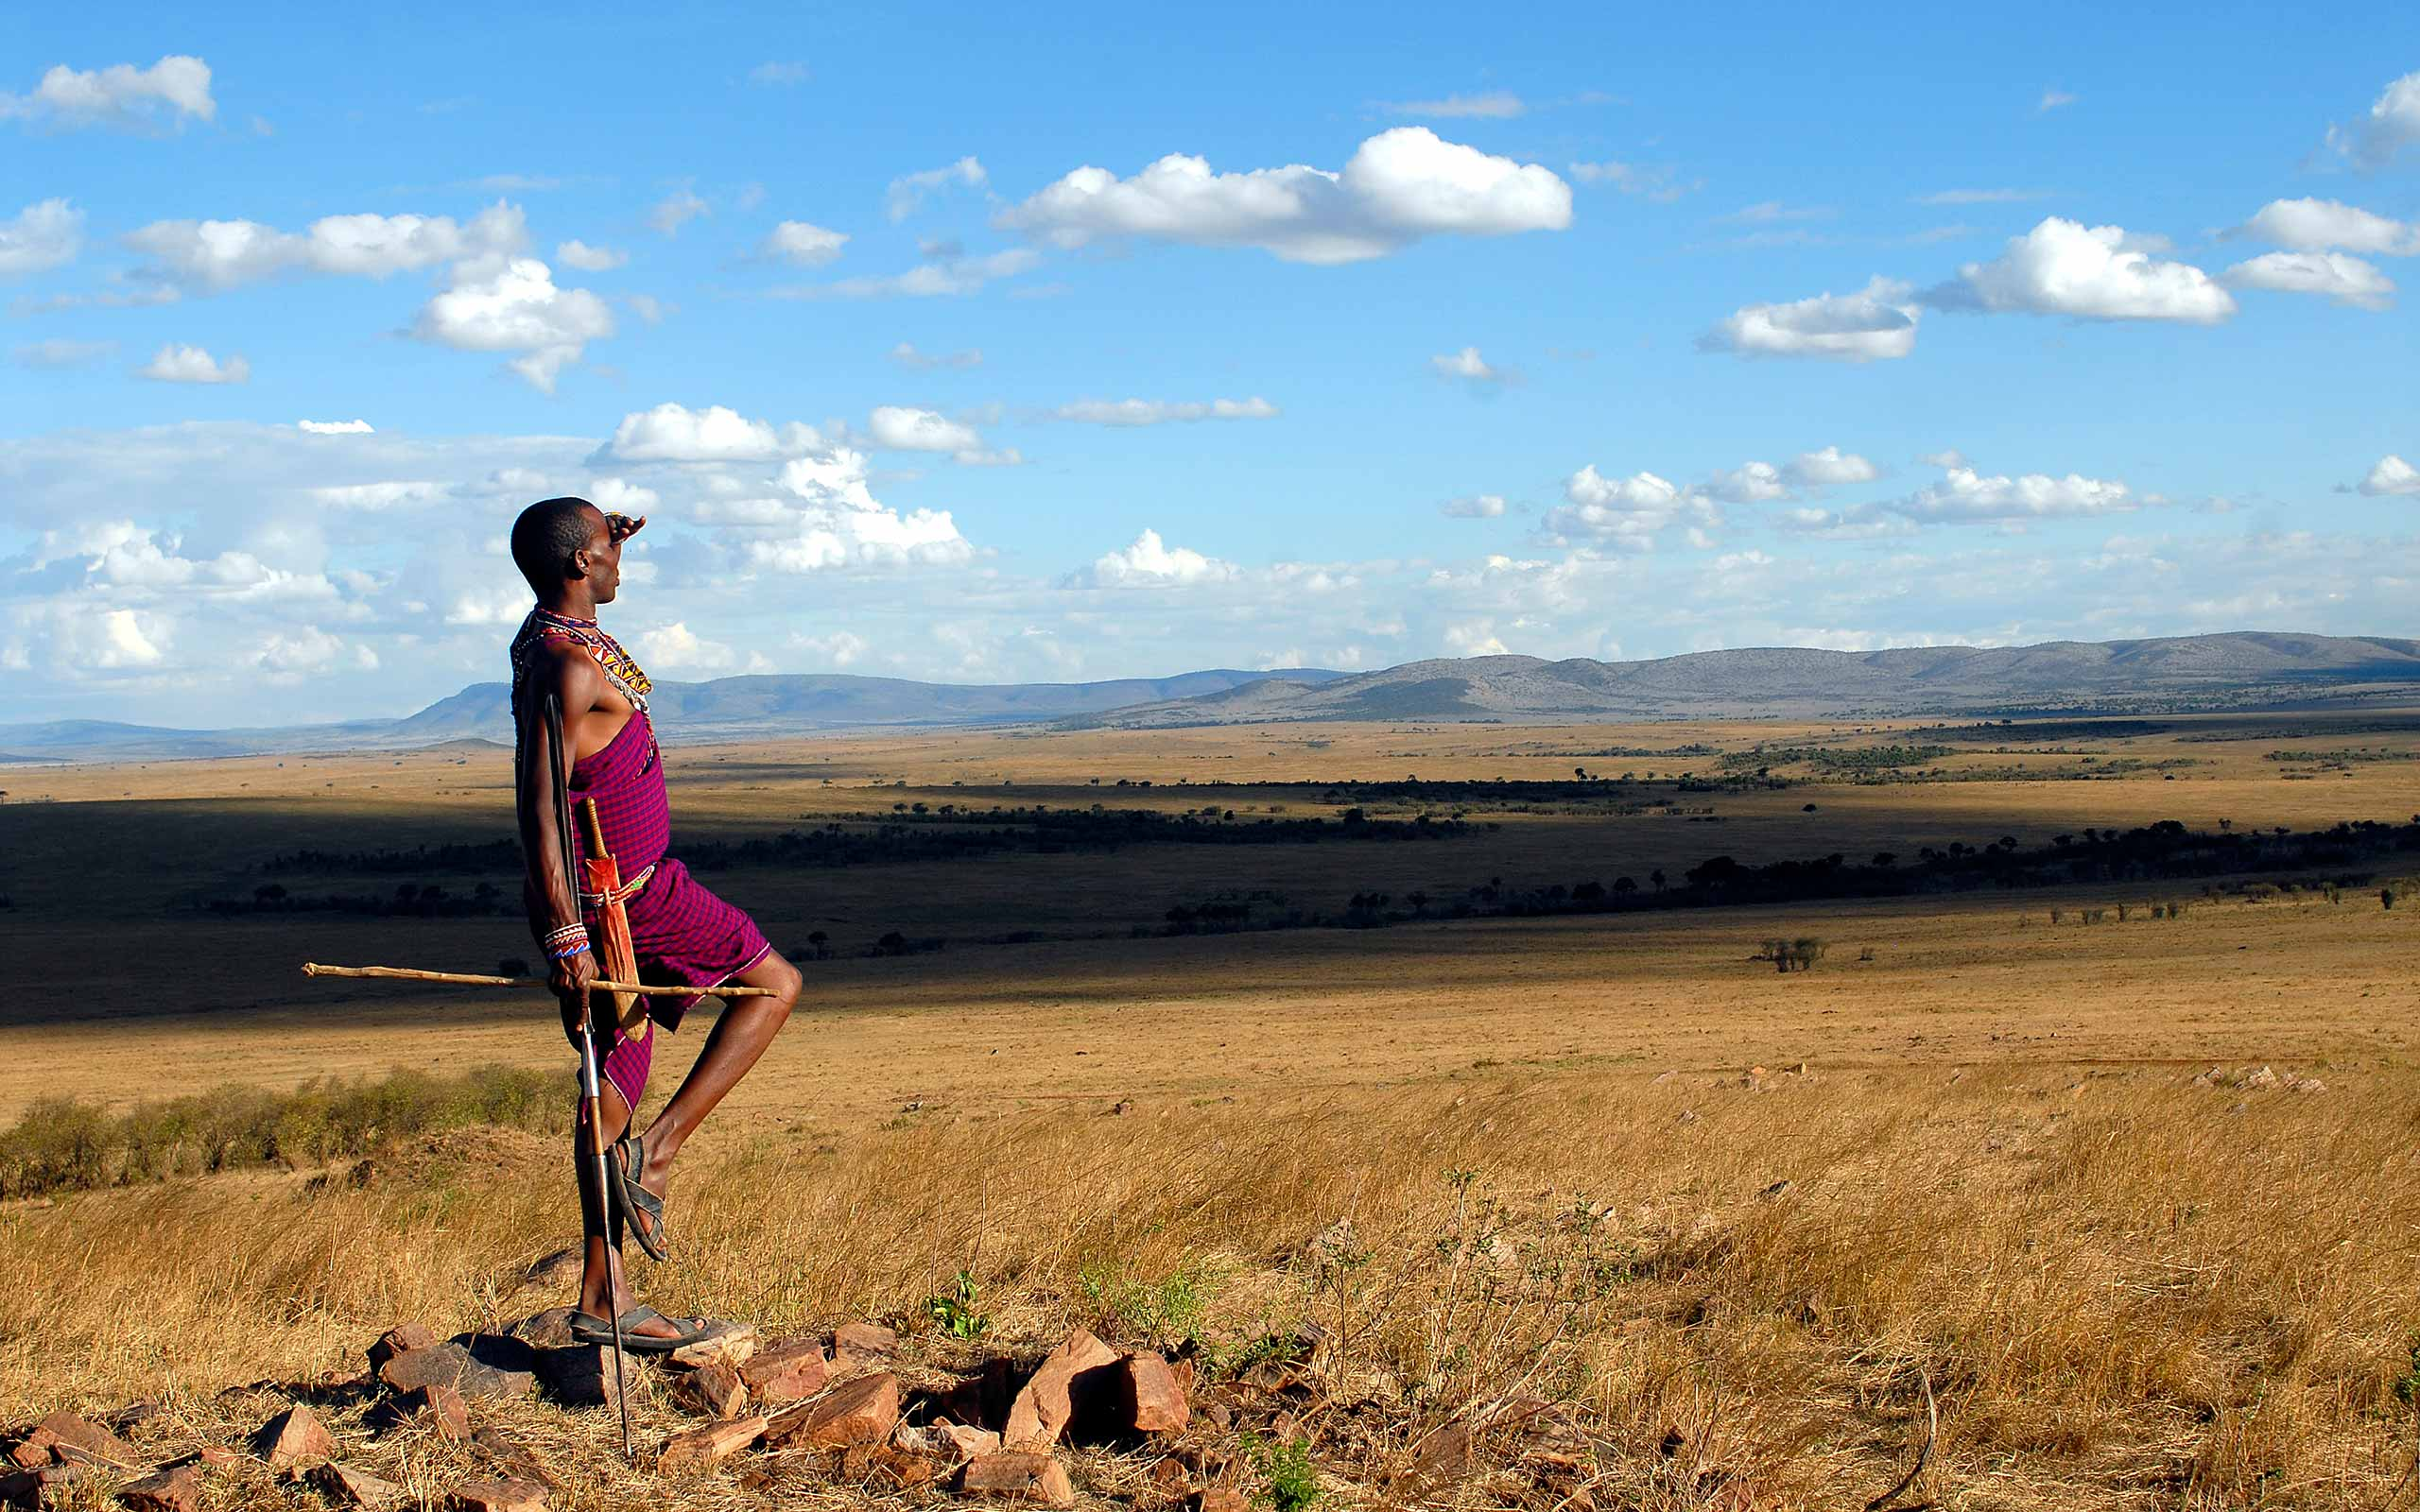 enkosi-africa-safari-kenya-masai-mara-kenya-tourism-board